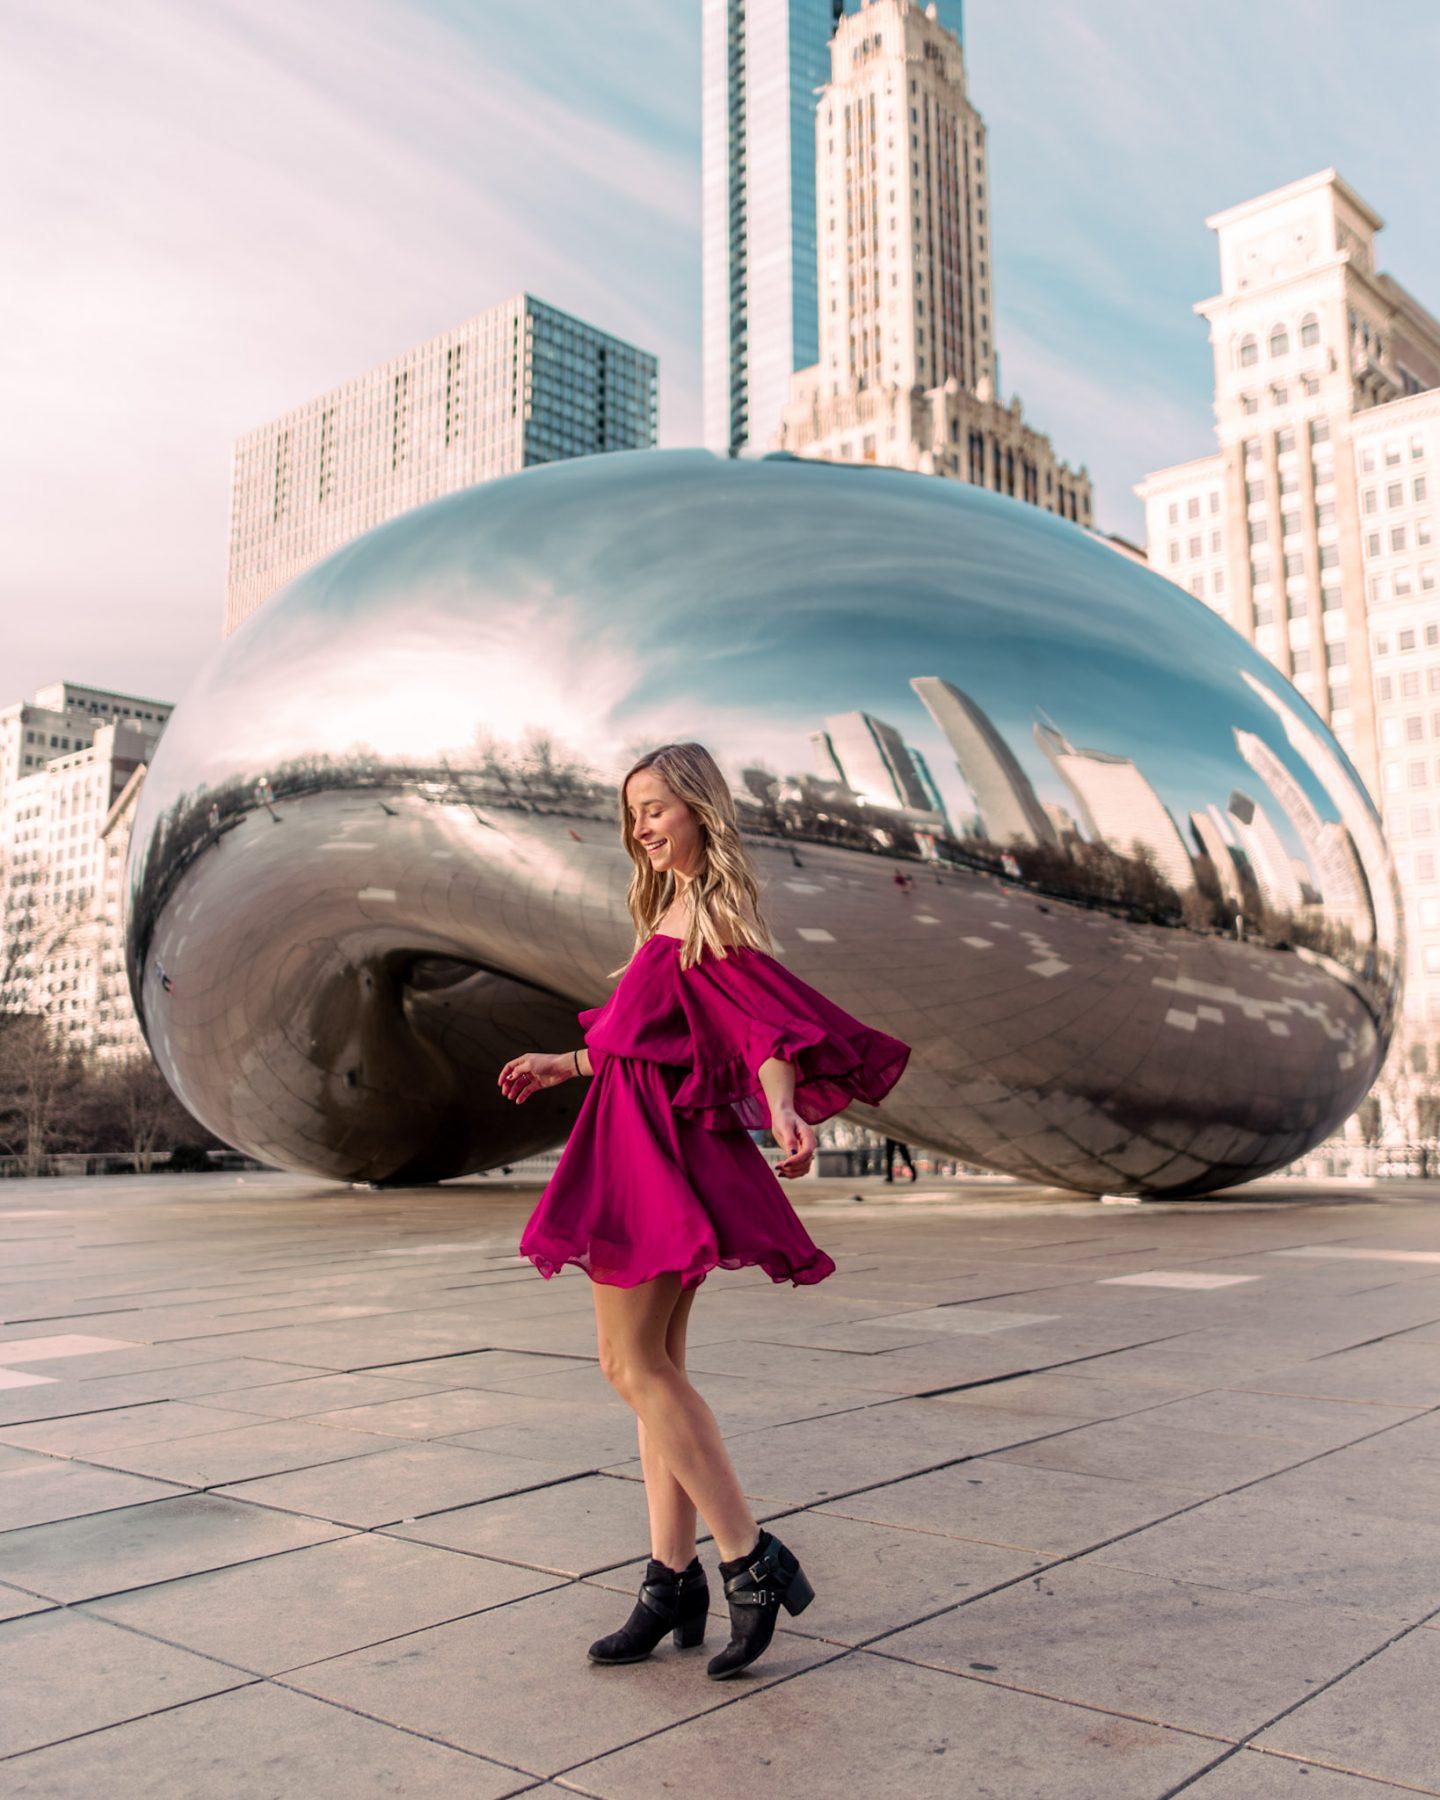 The chicago bean at Millennium Park